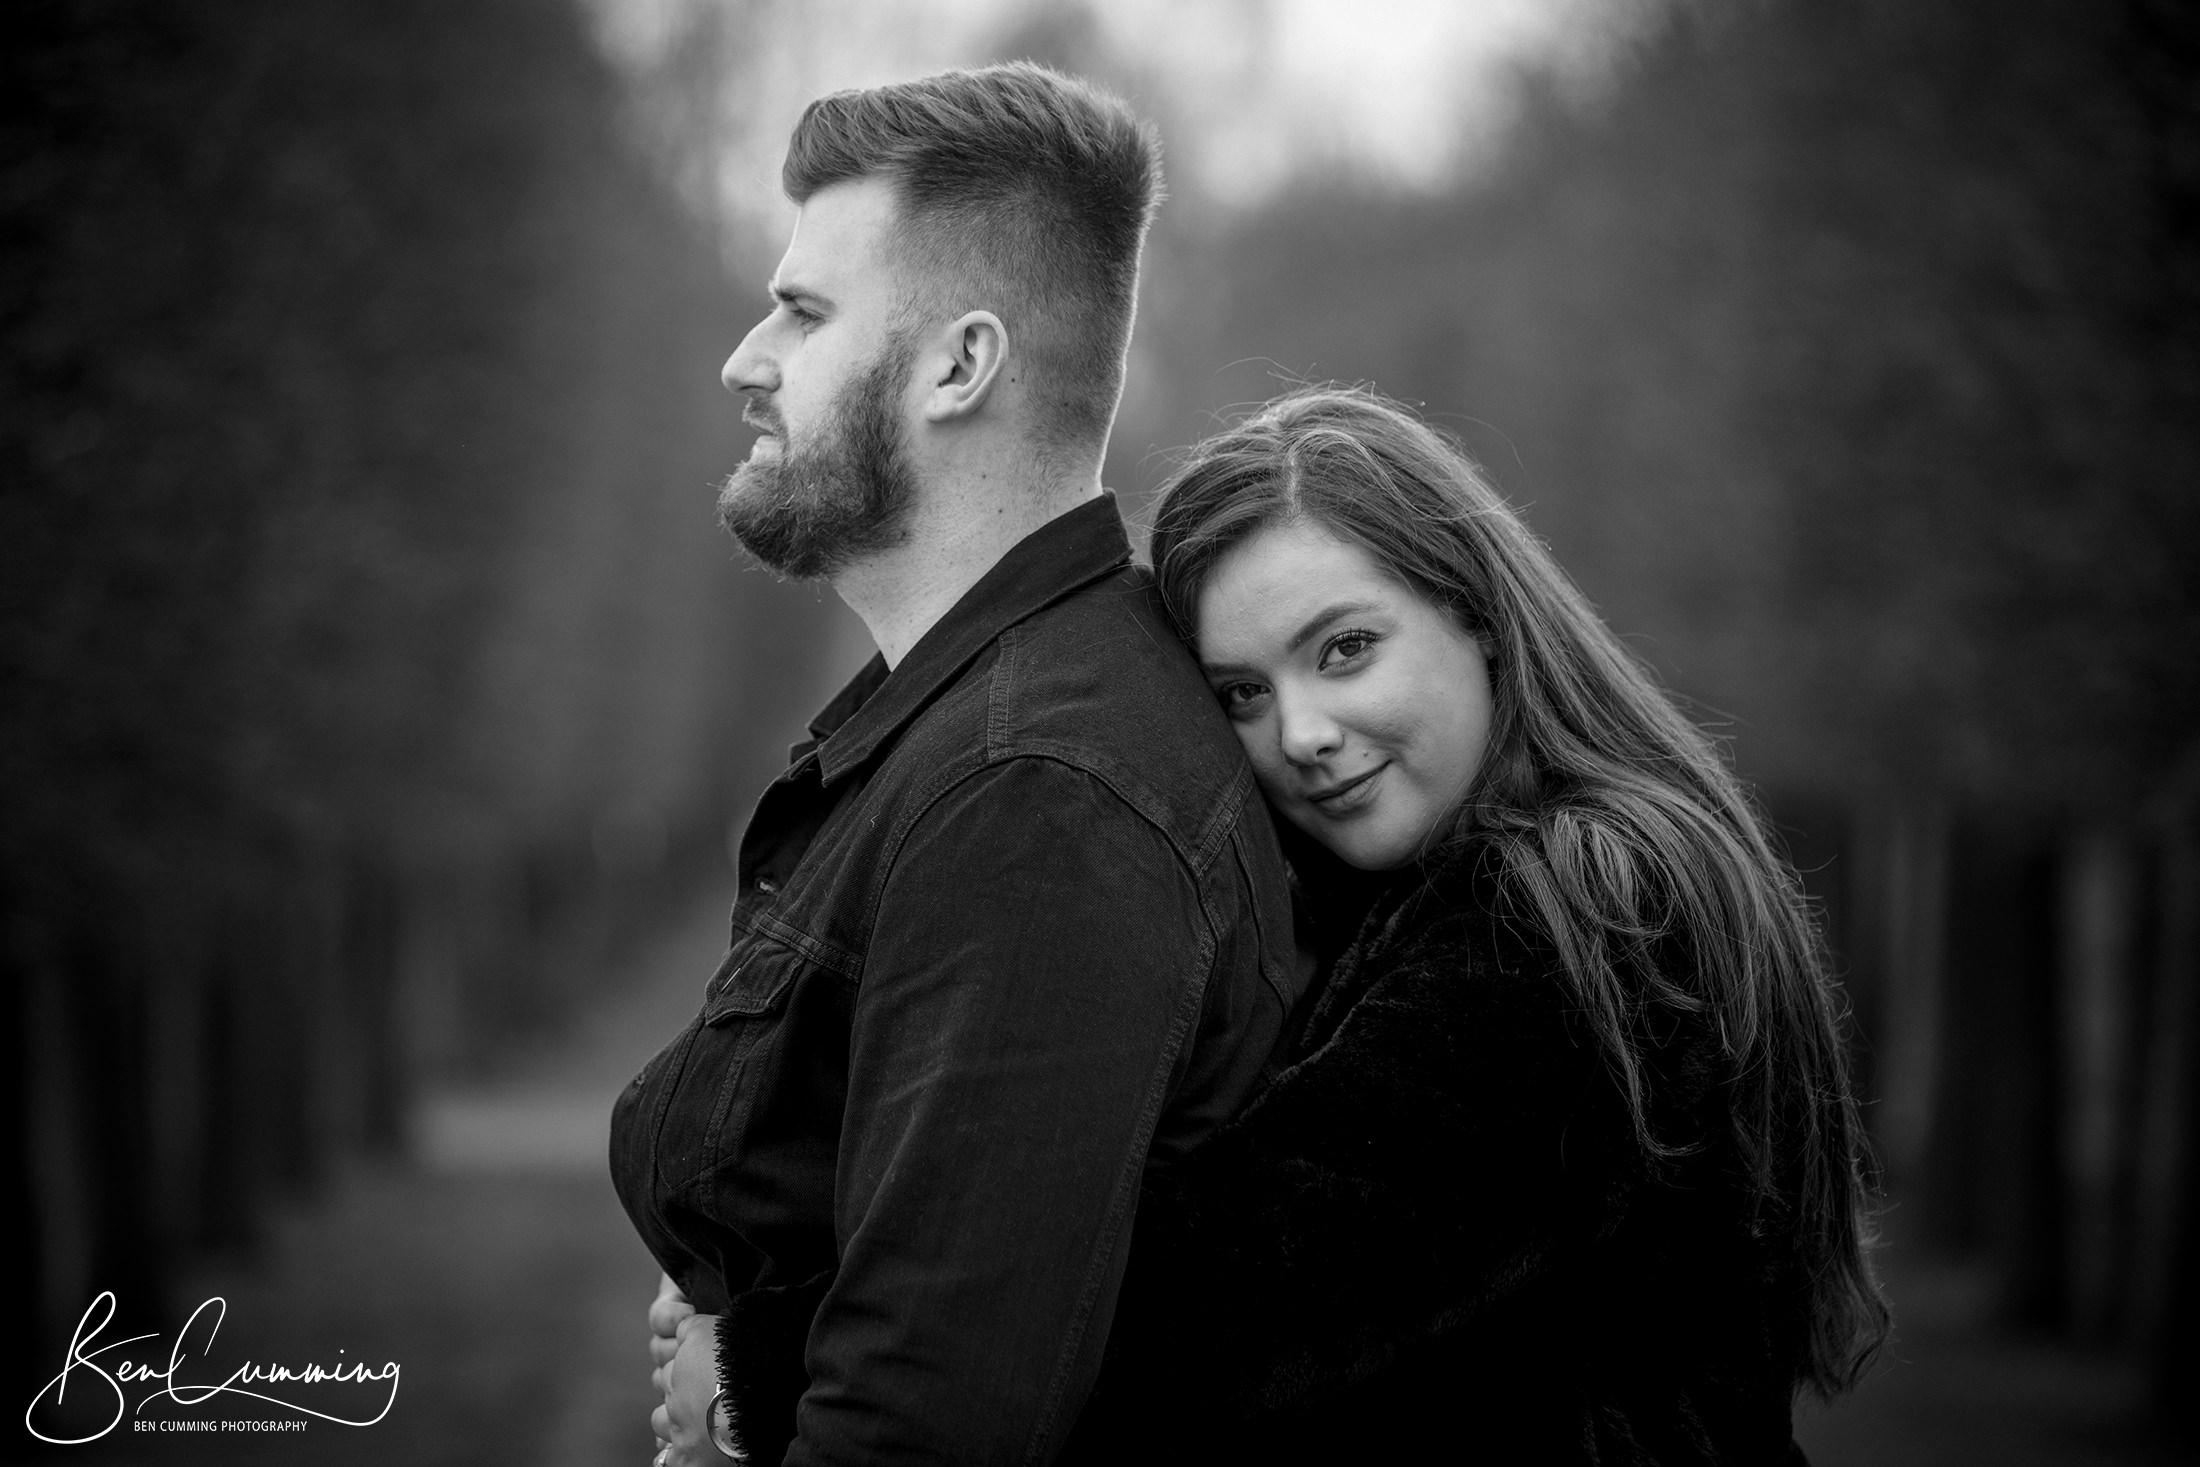 A couple pose for a romantic pre wedding photo